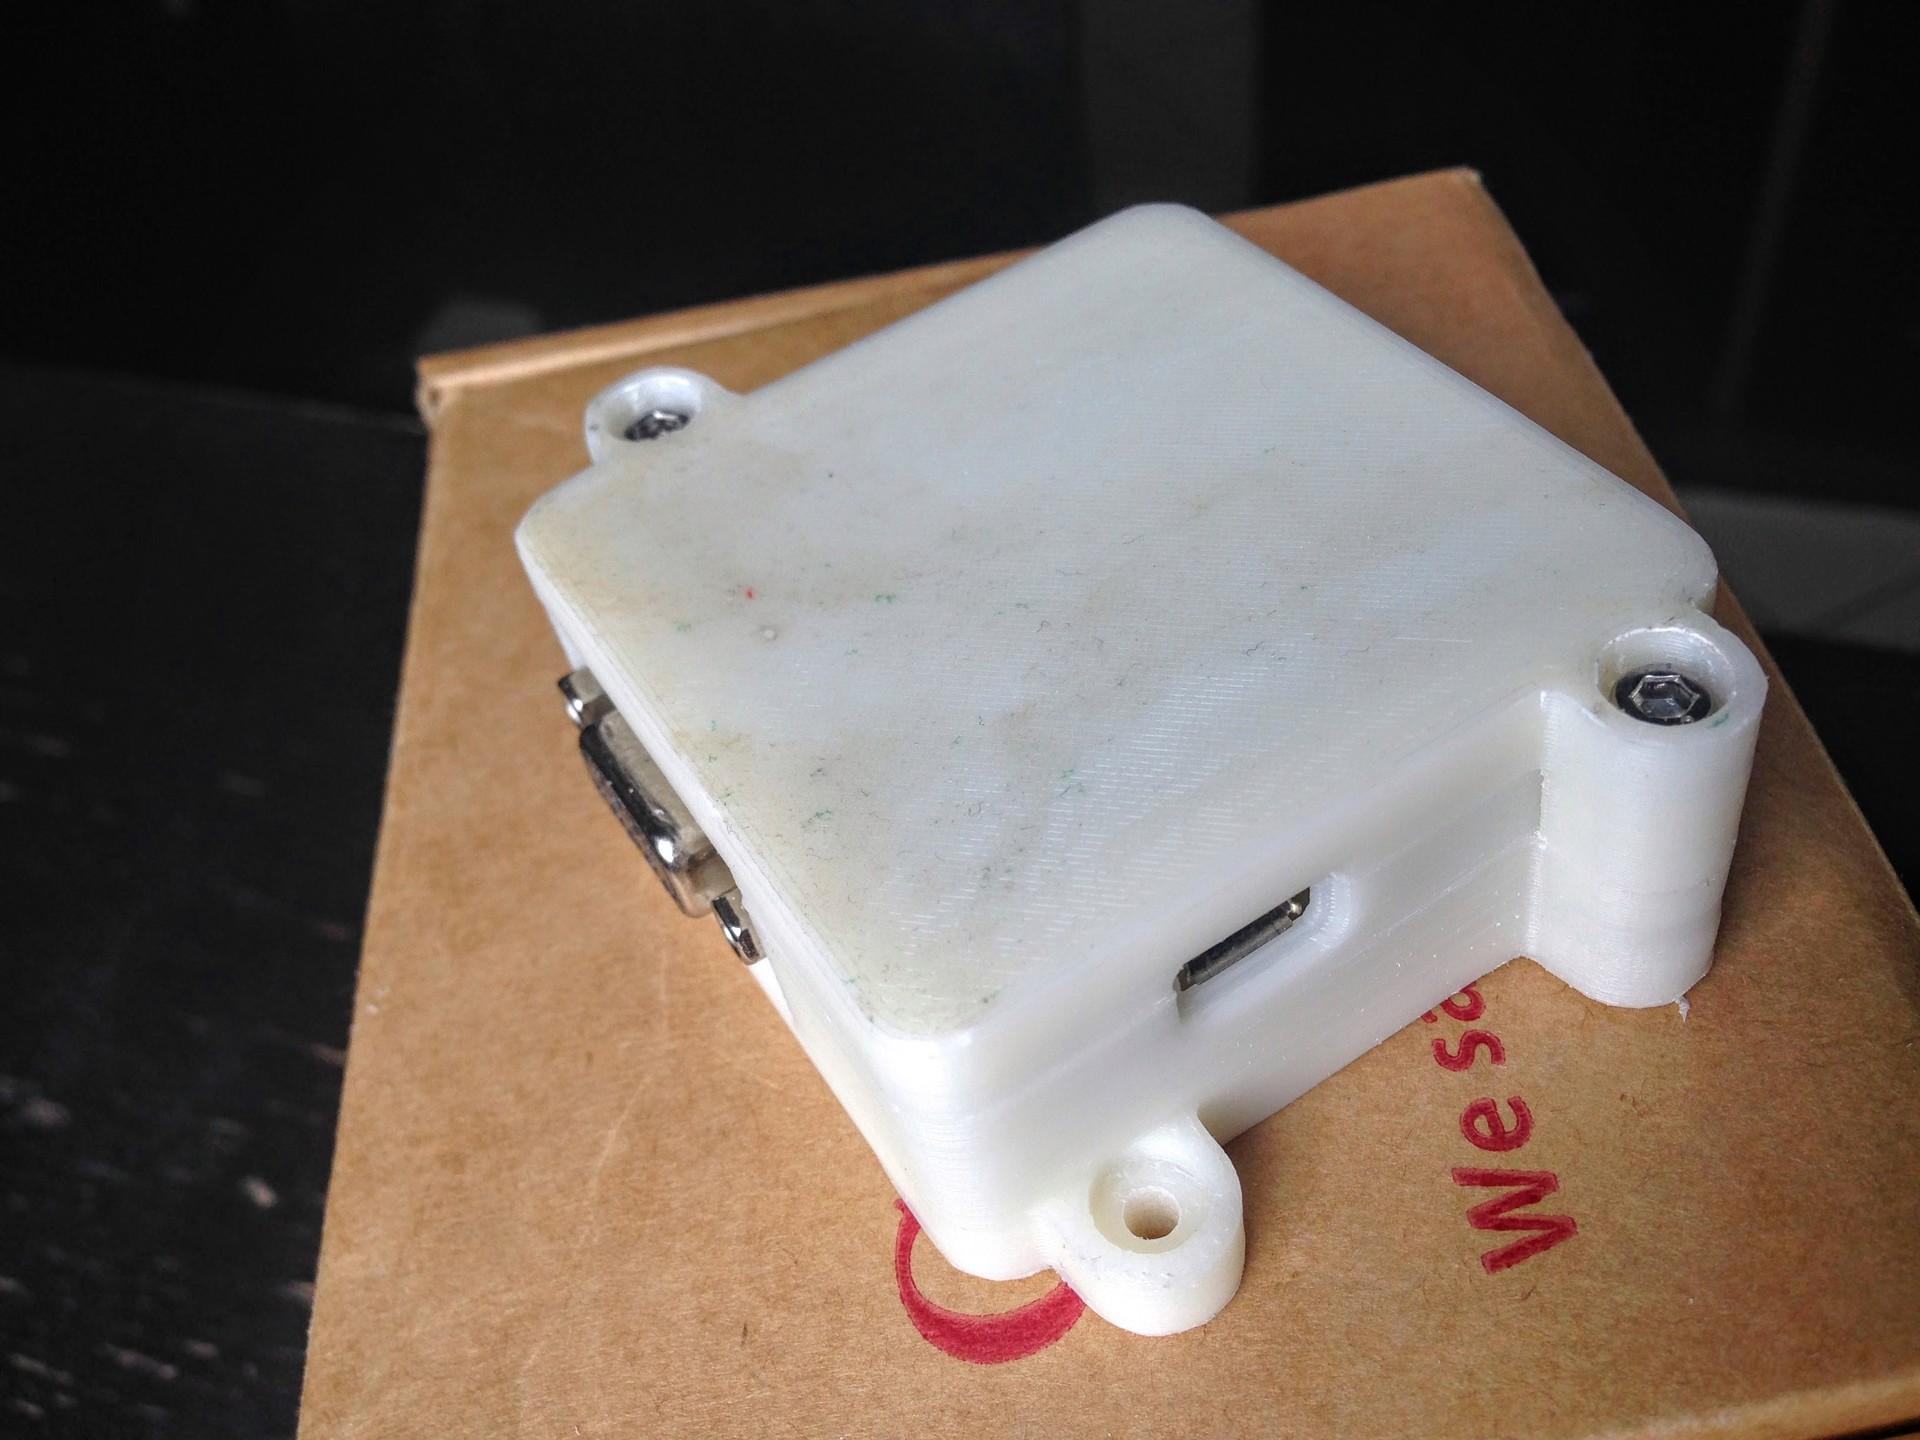 Адаптер педалей и-или шифтера Logitech G25-G27 на STM32 - 7